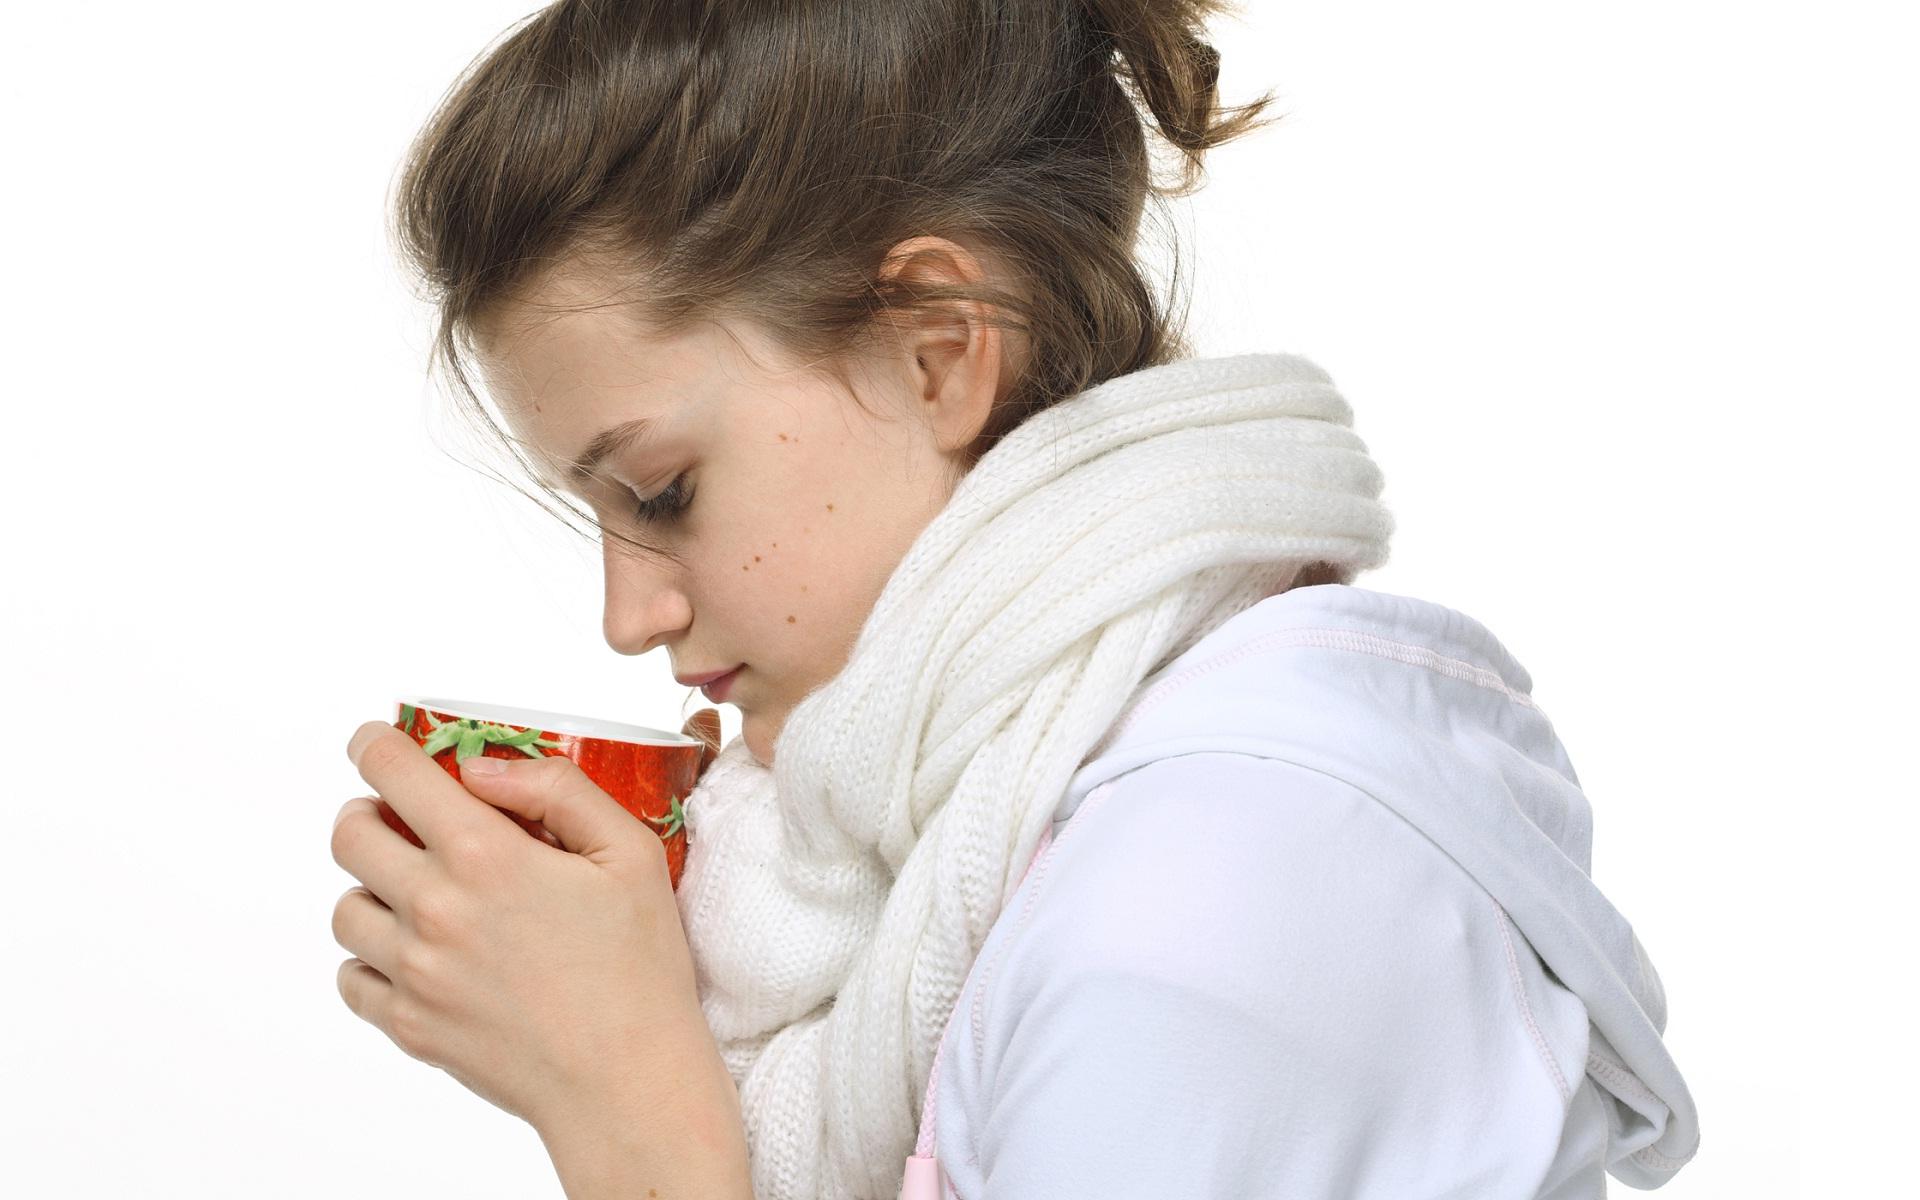 Как сбить температуру у взрослого при ангине в домашних условиях взрослому